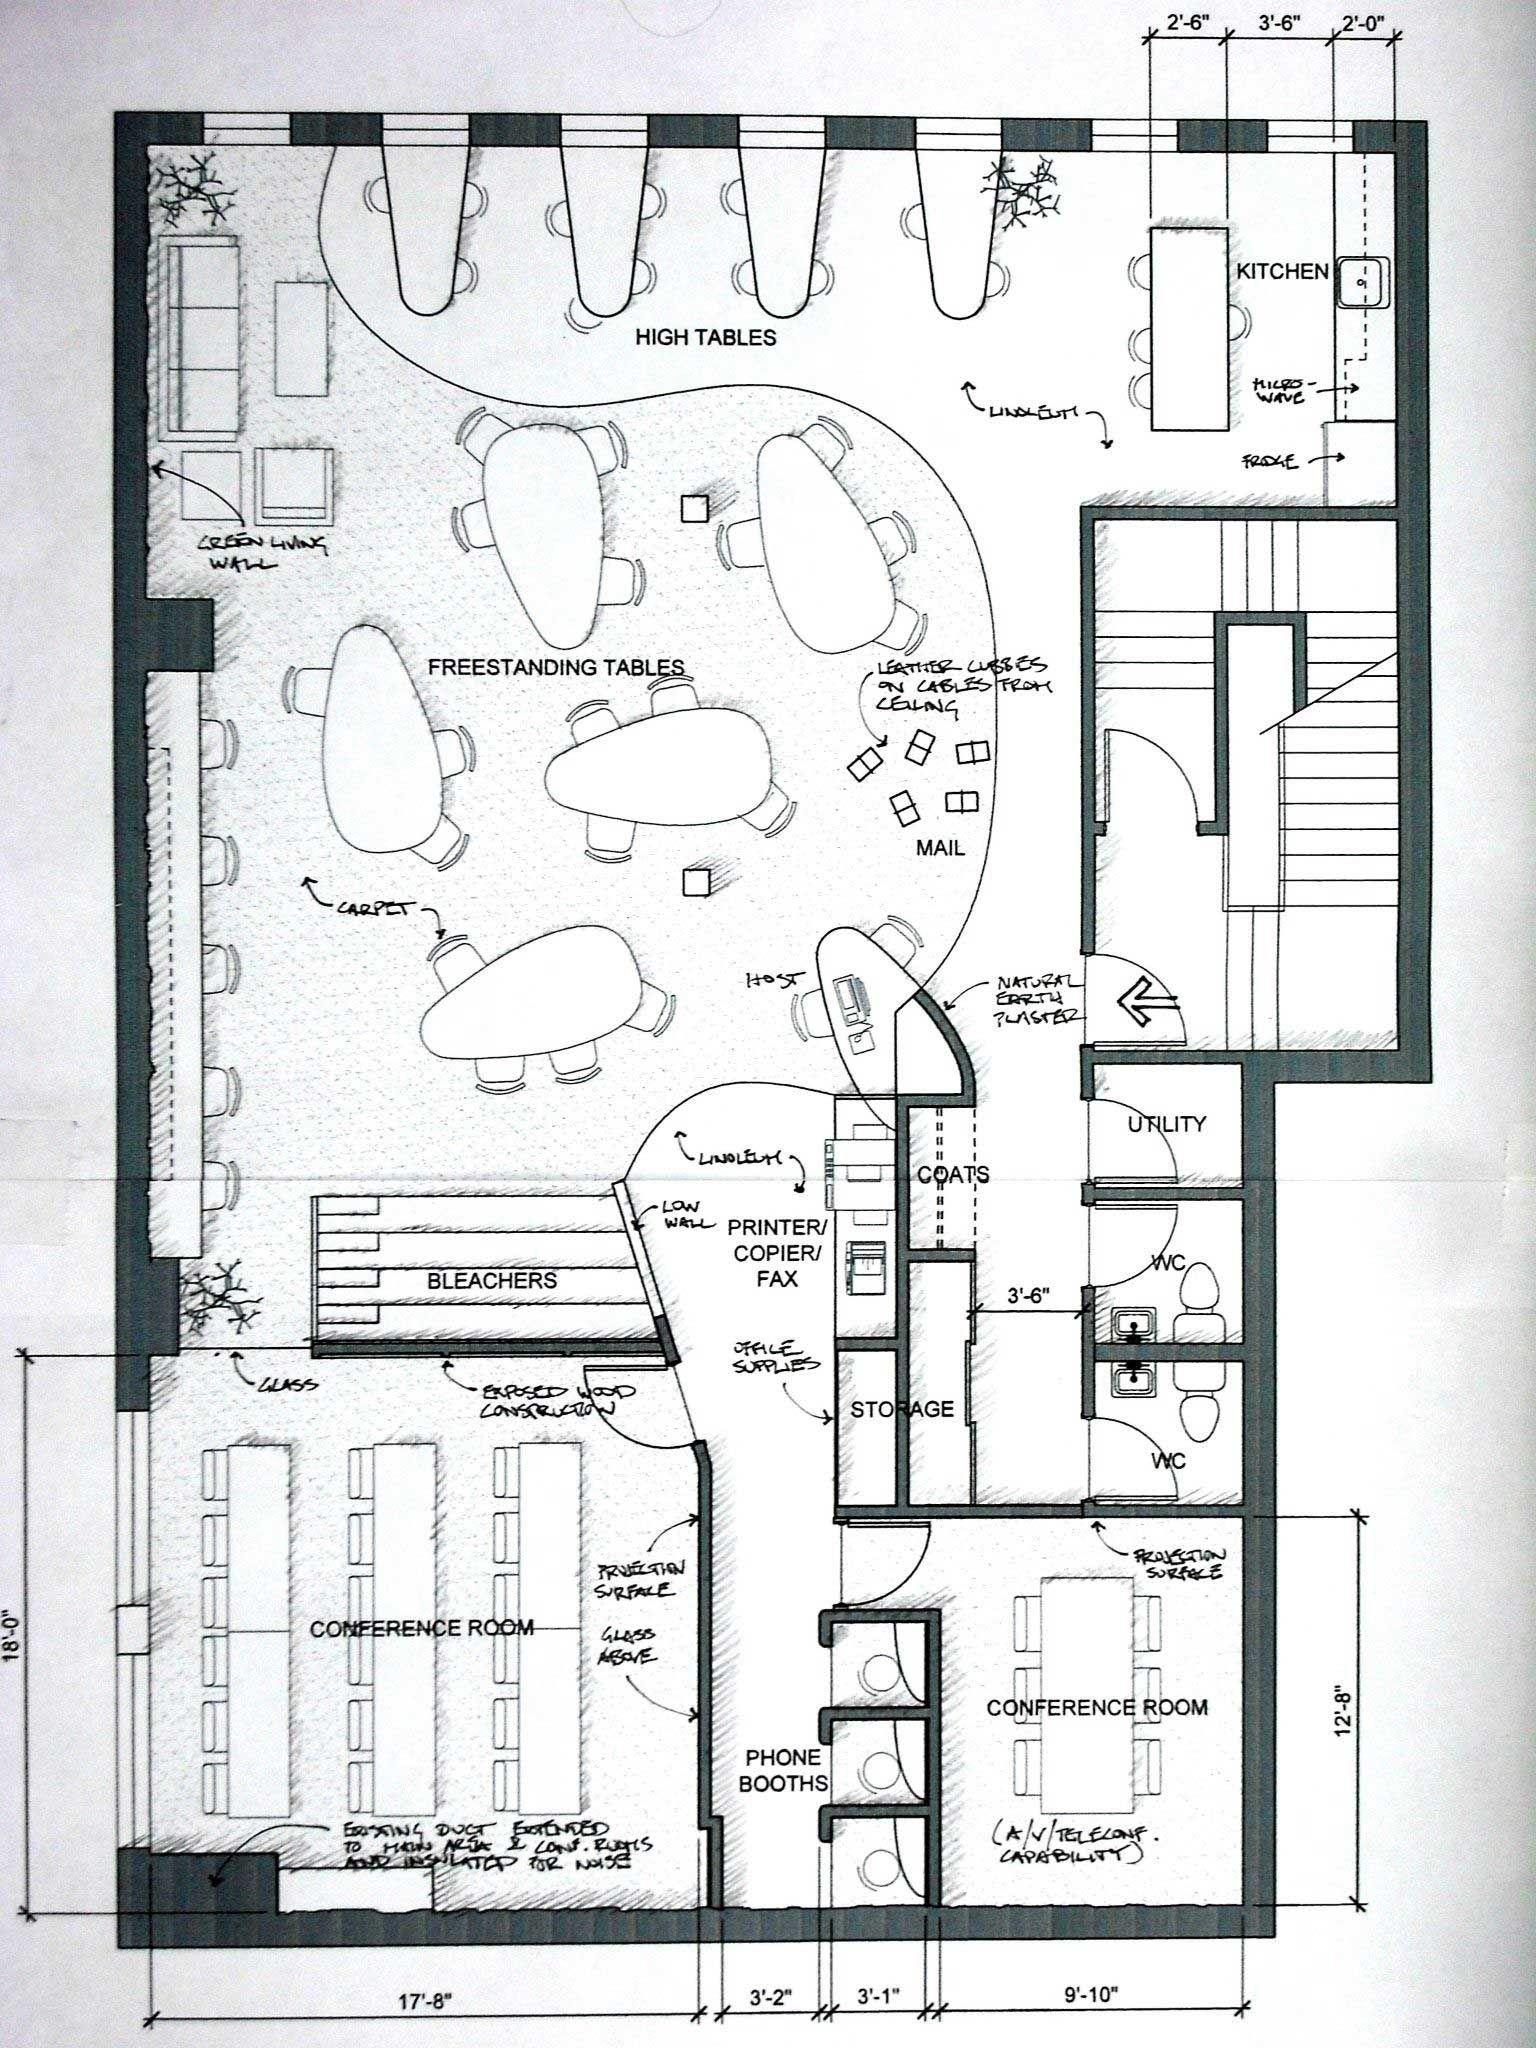 22 Inspiration Best Office Layout Design Office Layout Plan Office Space Planning Office Floor Plan